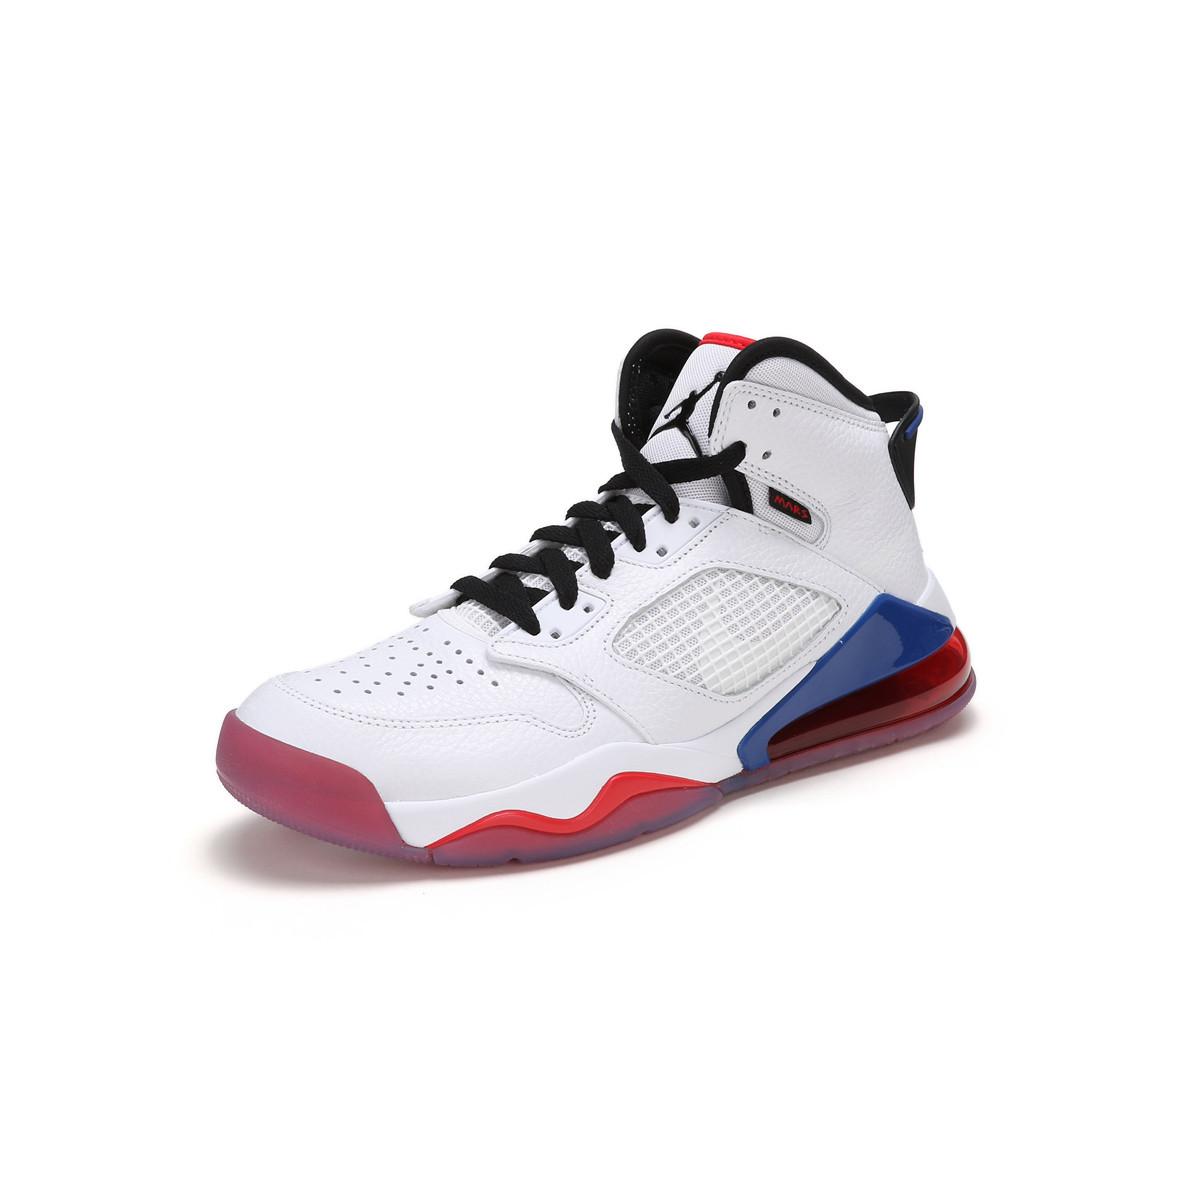 JORDAN MARS 270 男款缓震耐磨篮球鞋男鞋